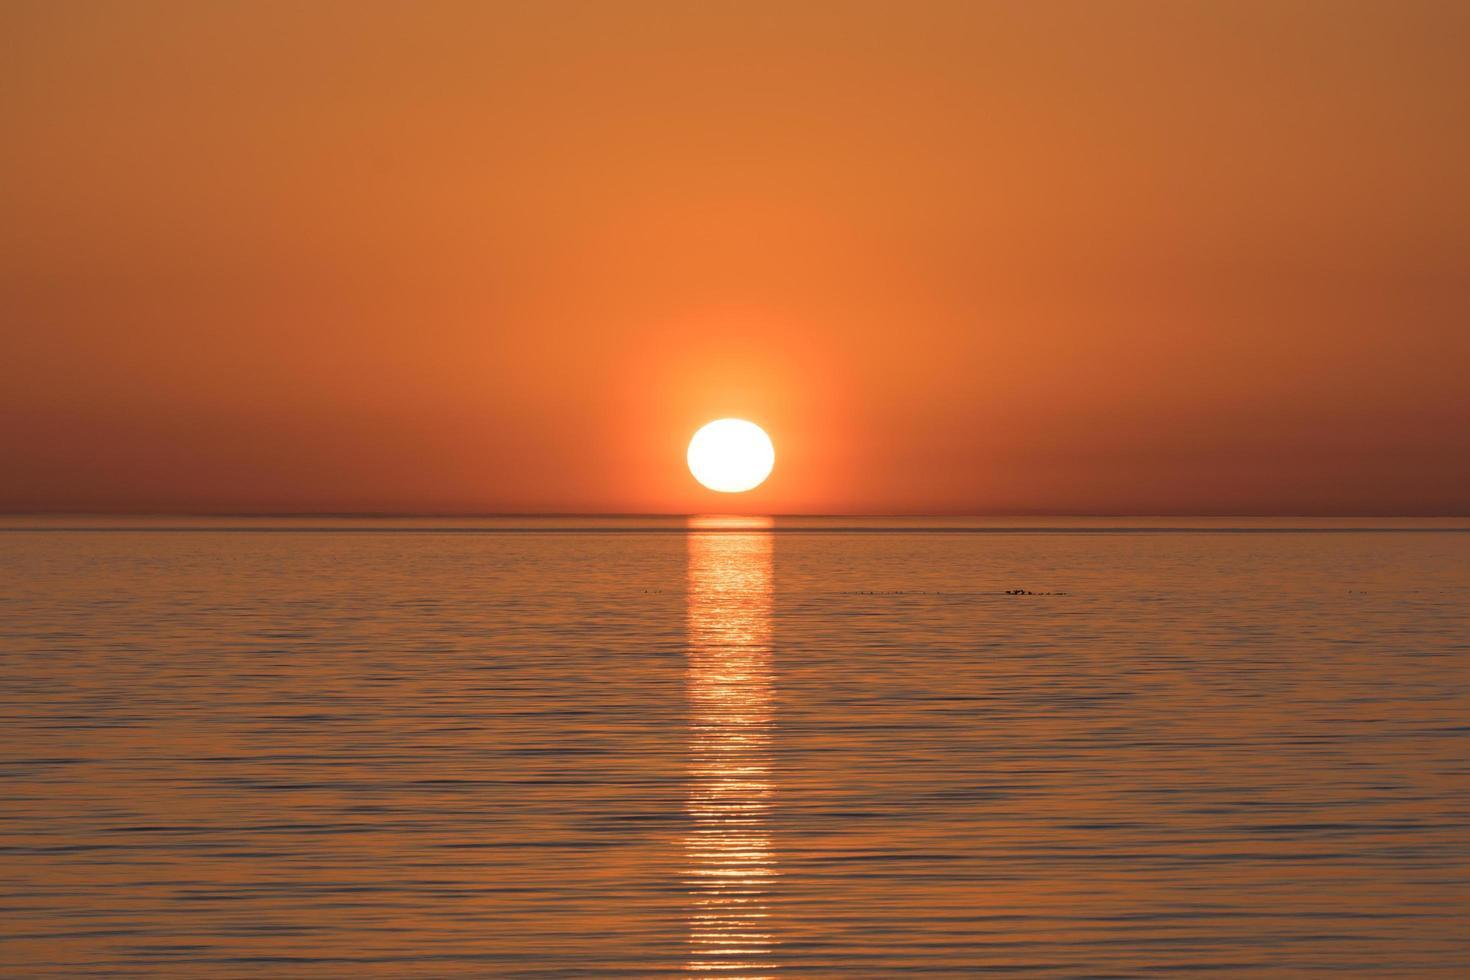 havslandskapets naturliga bakgrund foto